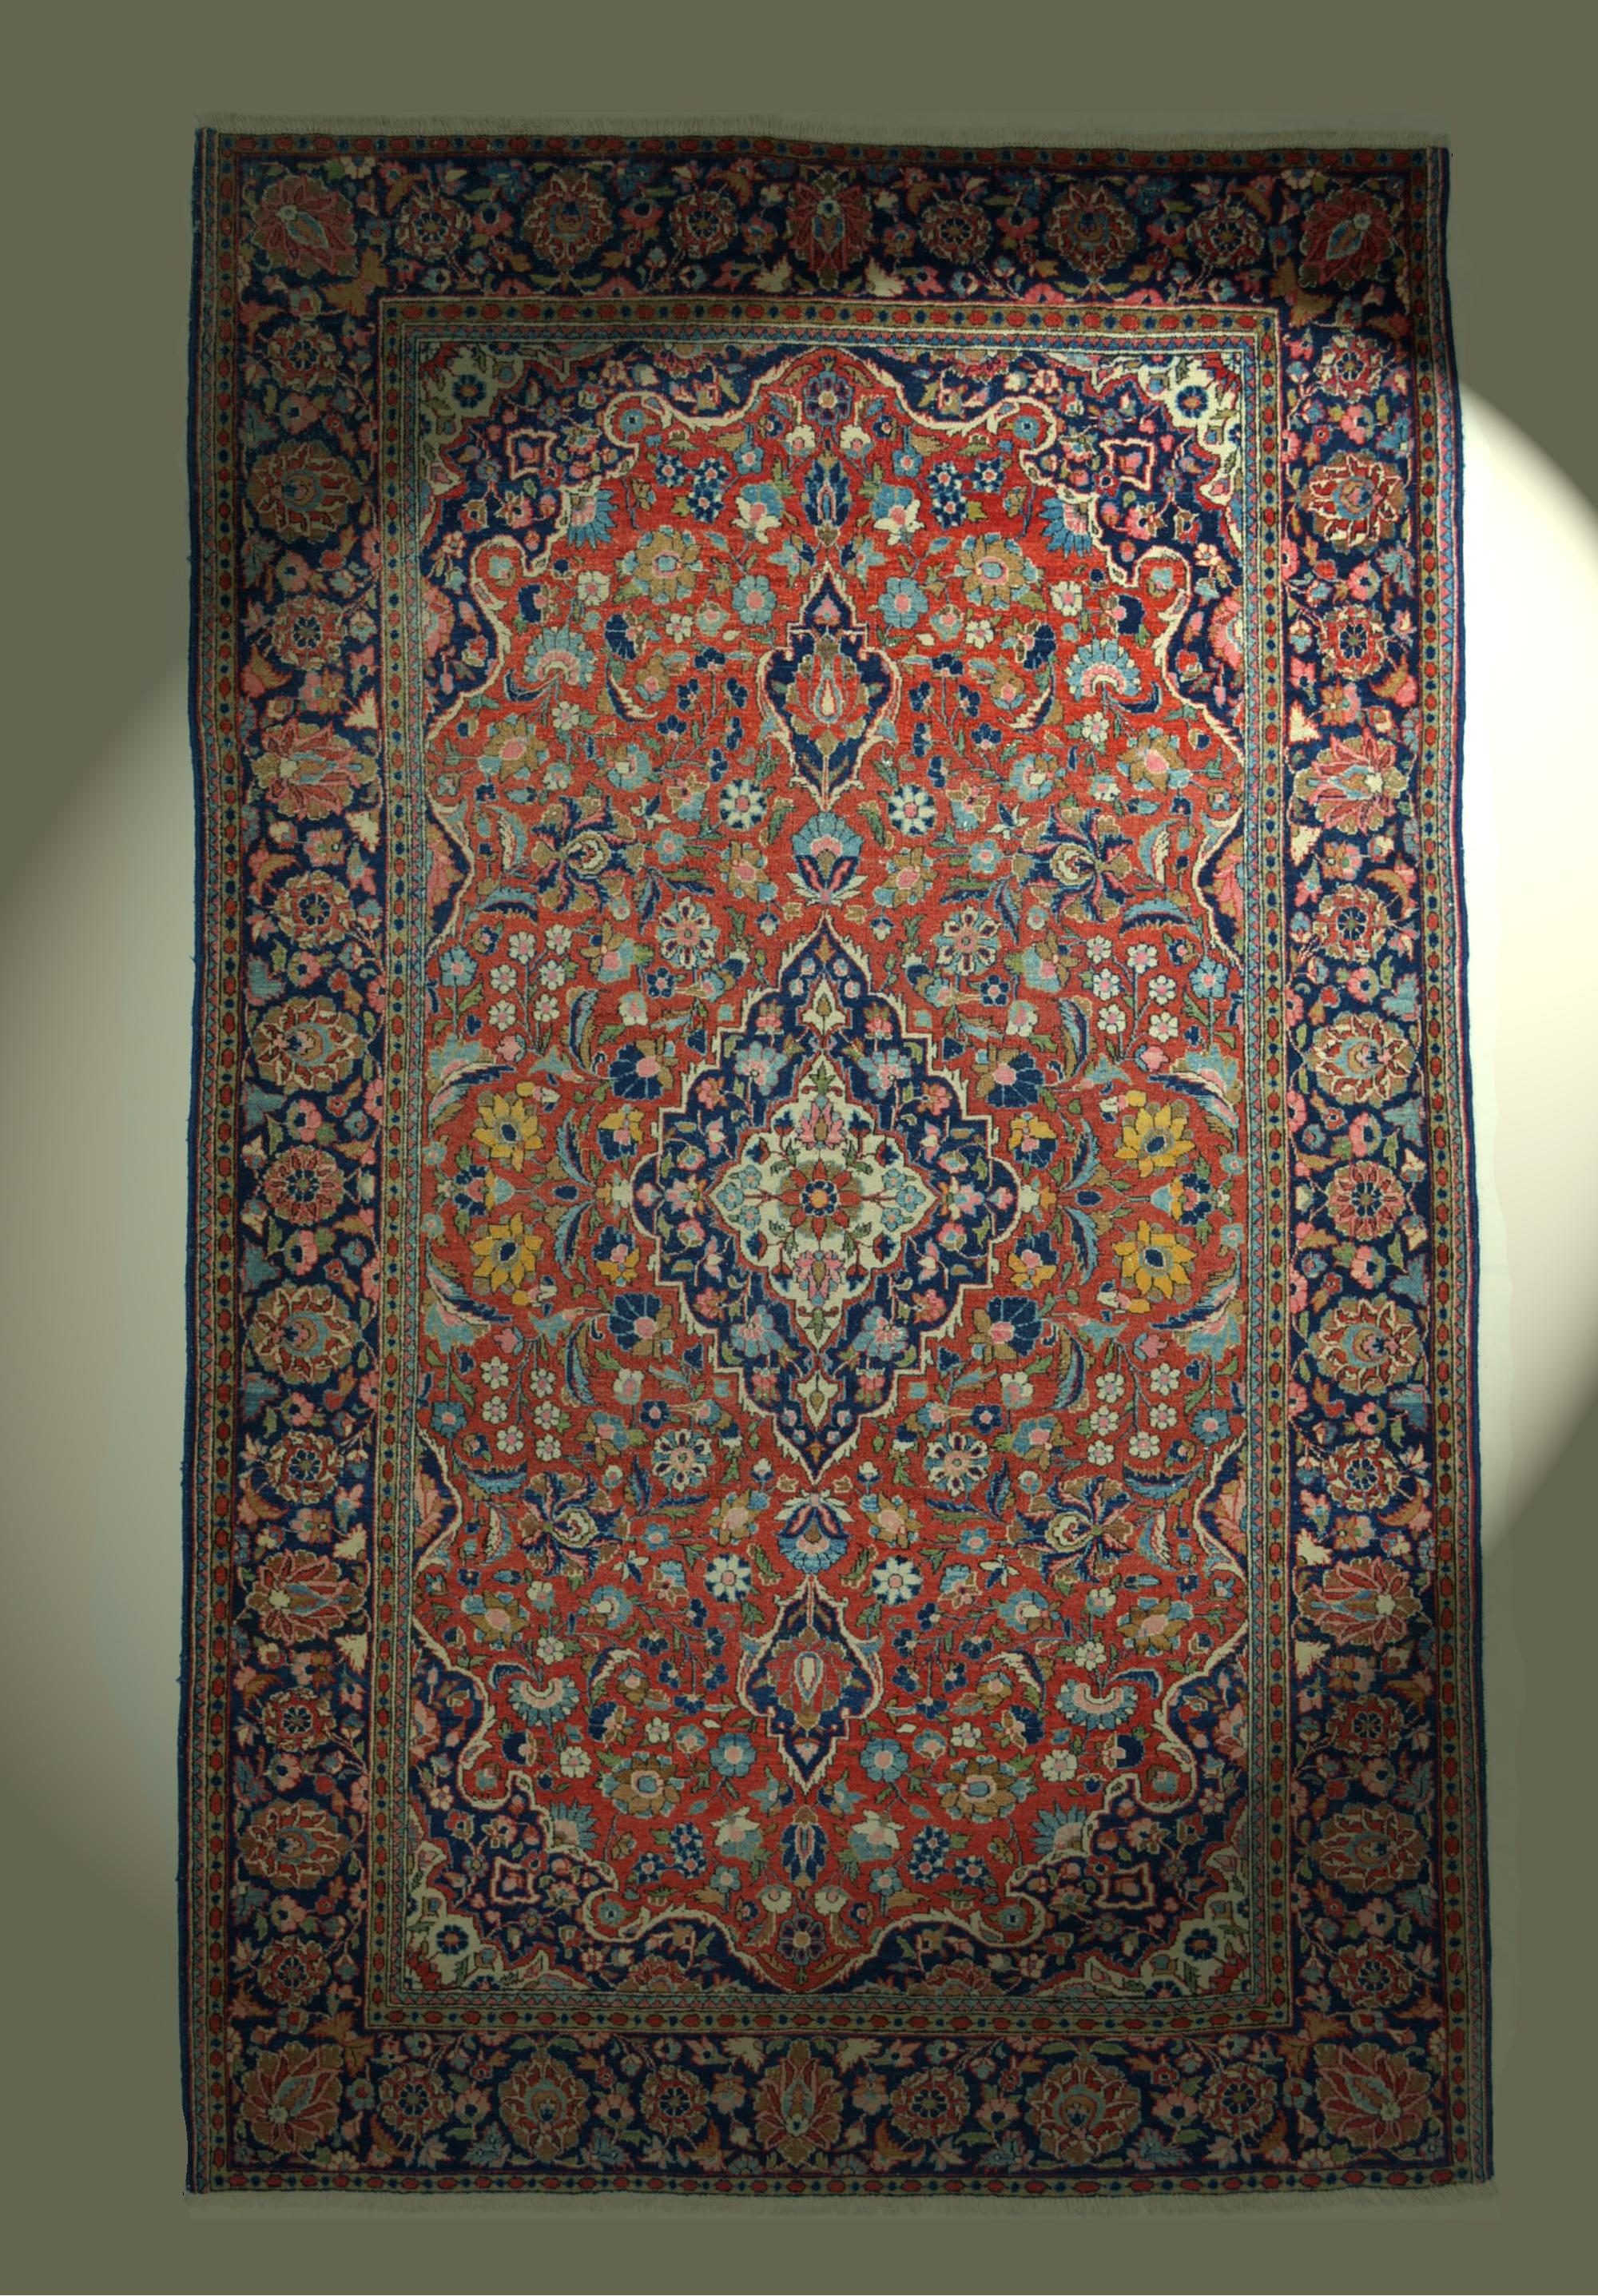 antik keshan orient teppich pflanzenfarben kashan rug tapis tappeto 202x126 cm ebay. Black Bedroom Furniture Sets. Home Design Ideas